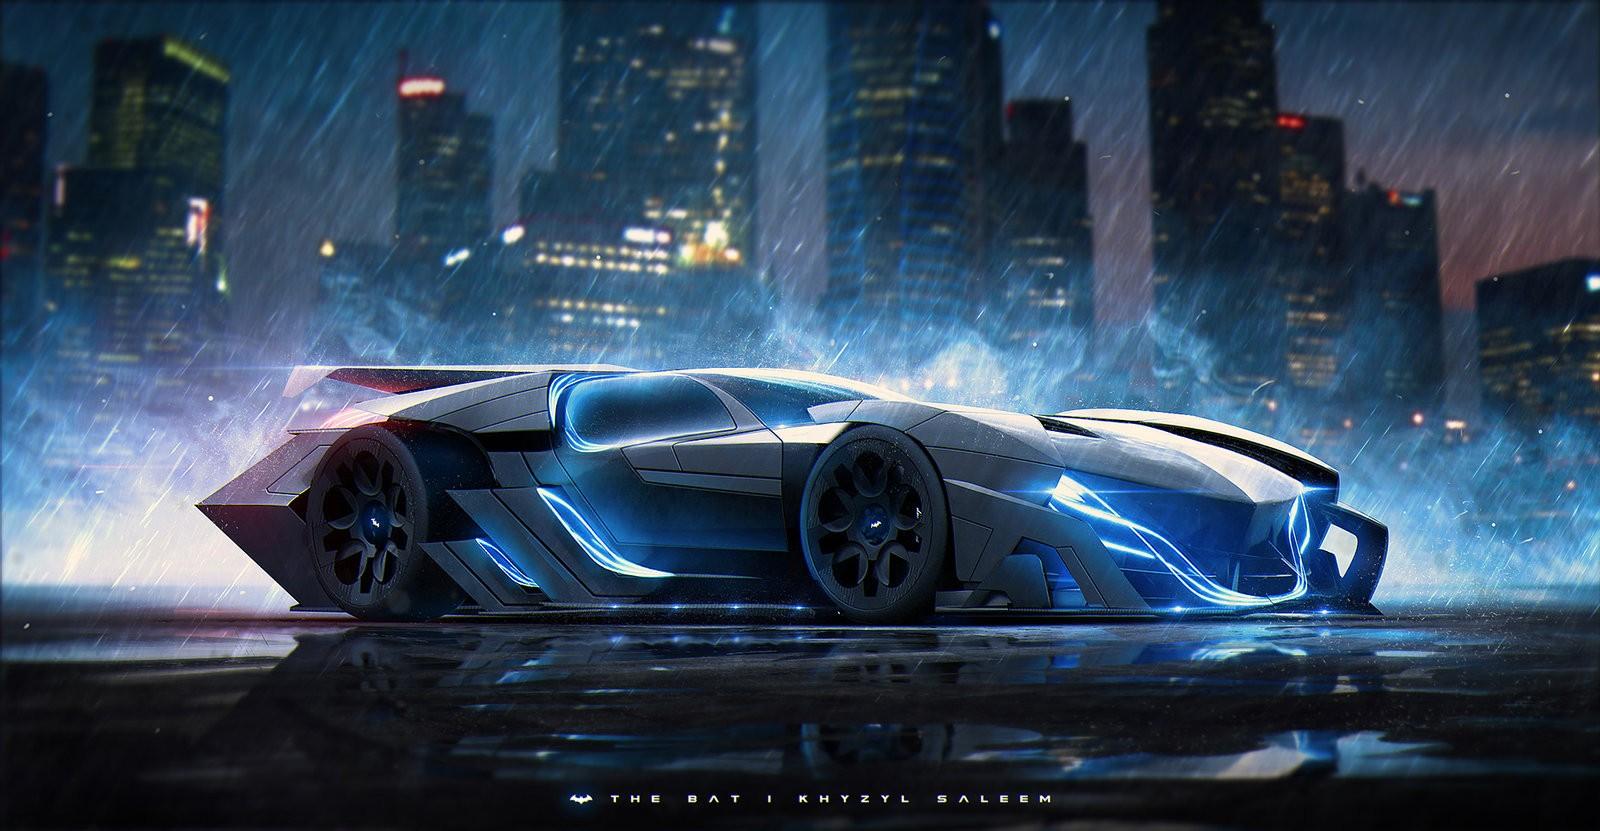 Wallpaper : Batman, Lamborghini Aventador, Batmobile, sports car ... for batman lamborghini concept  555kxo